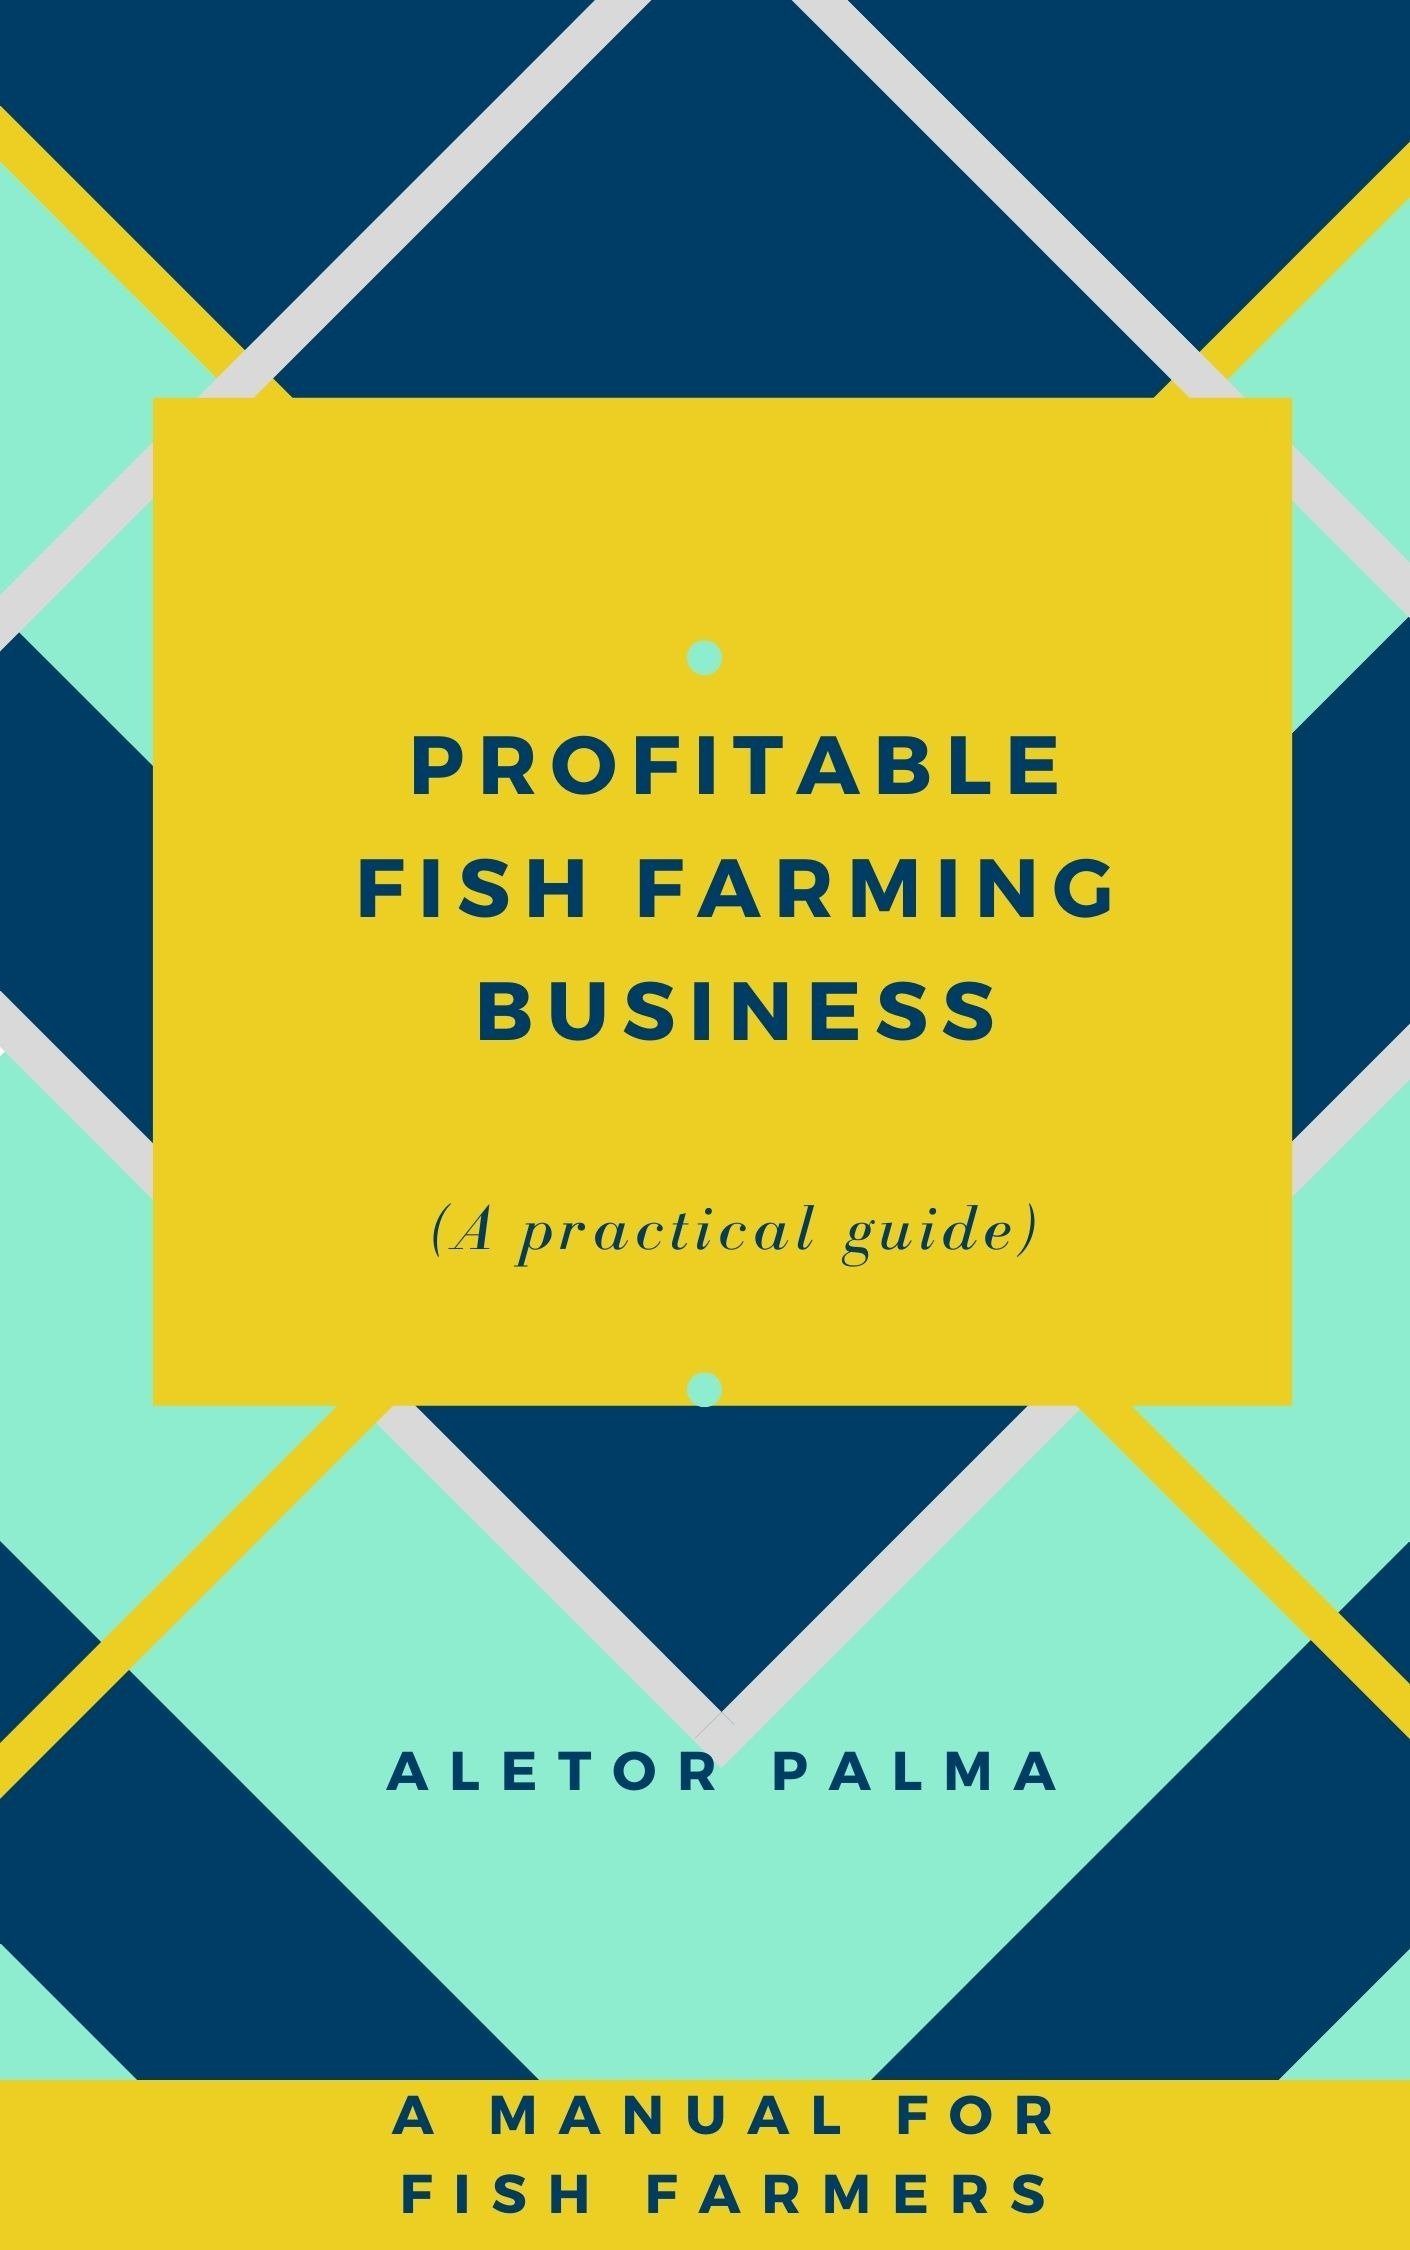 Profitable Fish Farming Business